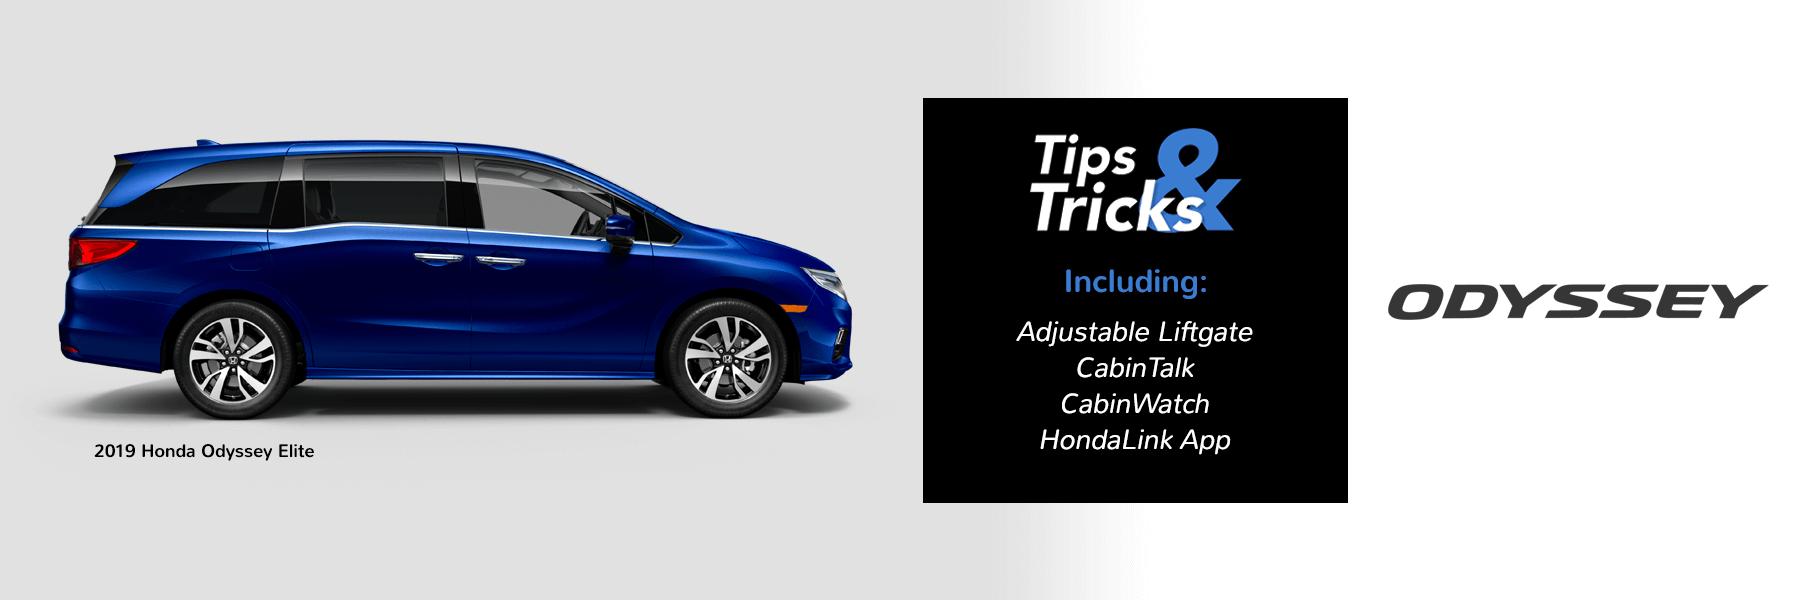 Honda Tips and Tricks 2019 Odyssey Slider